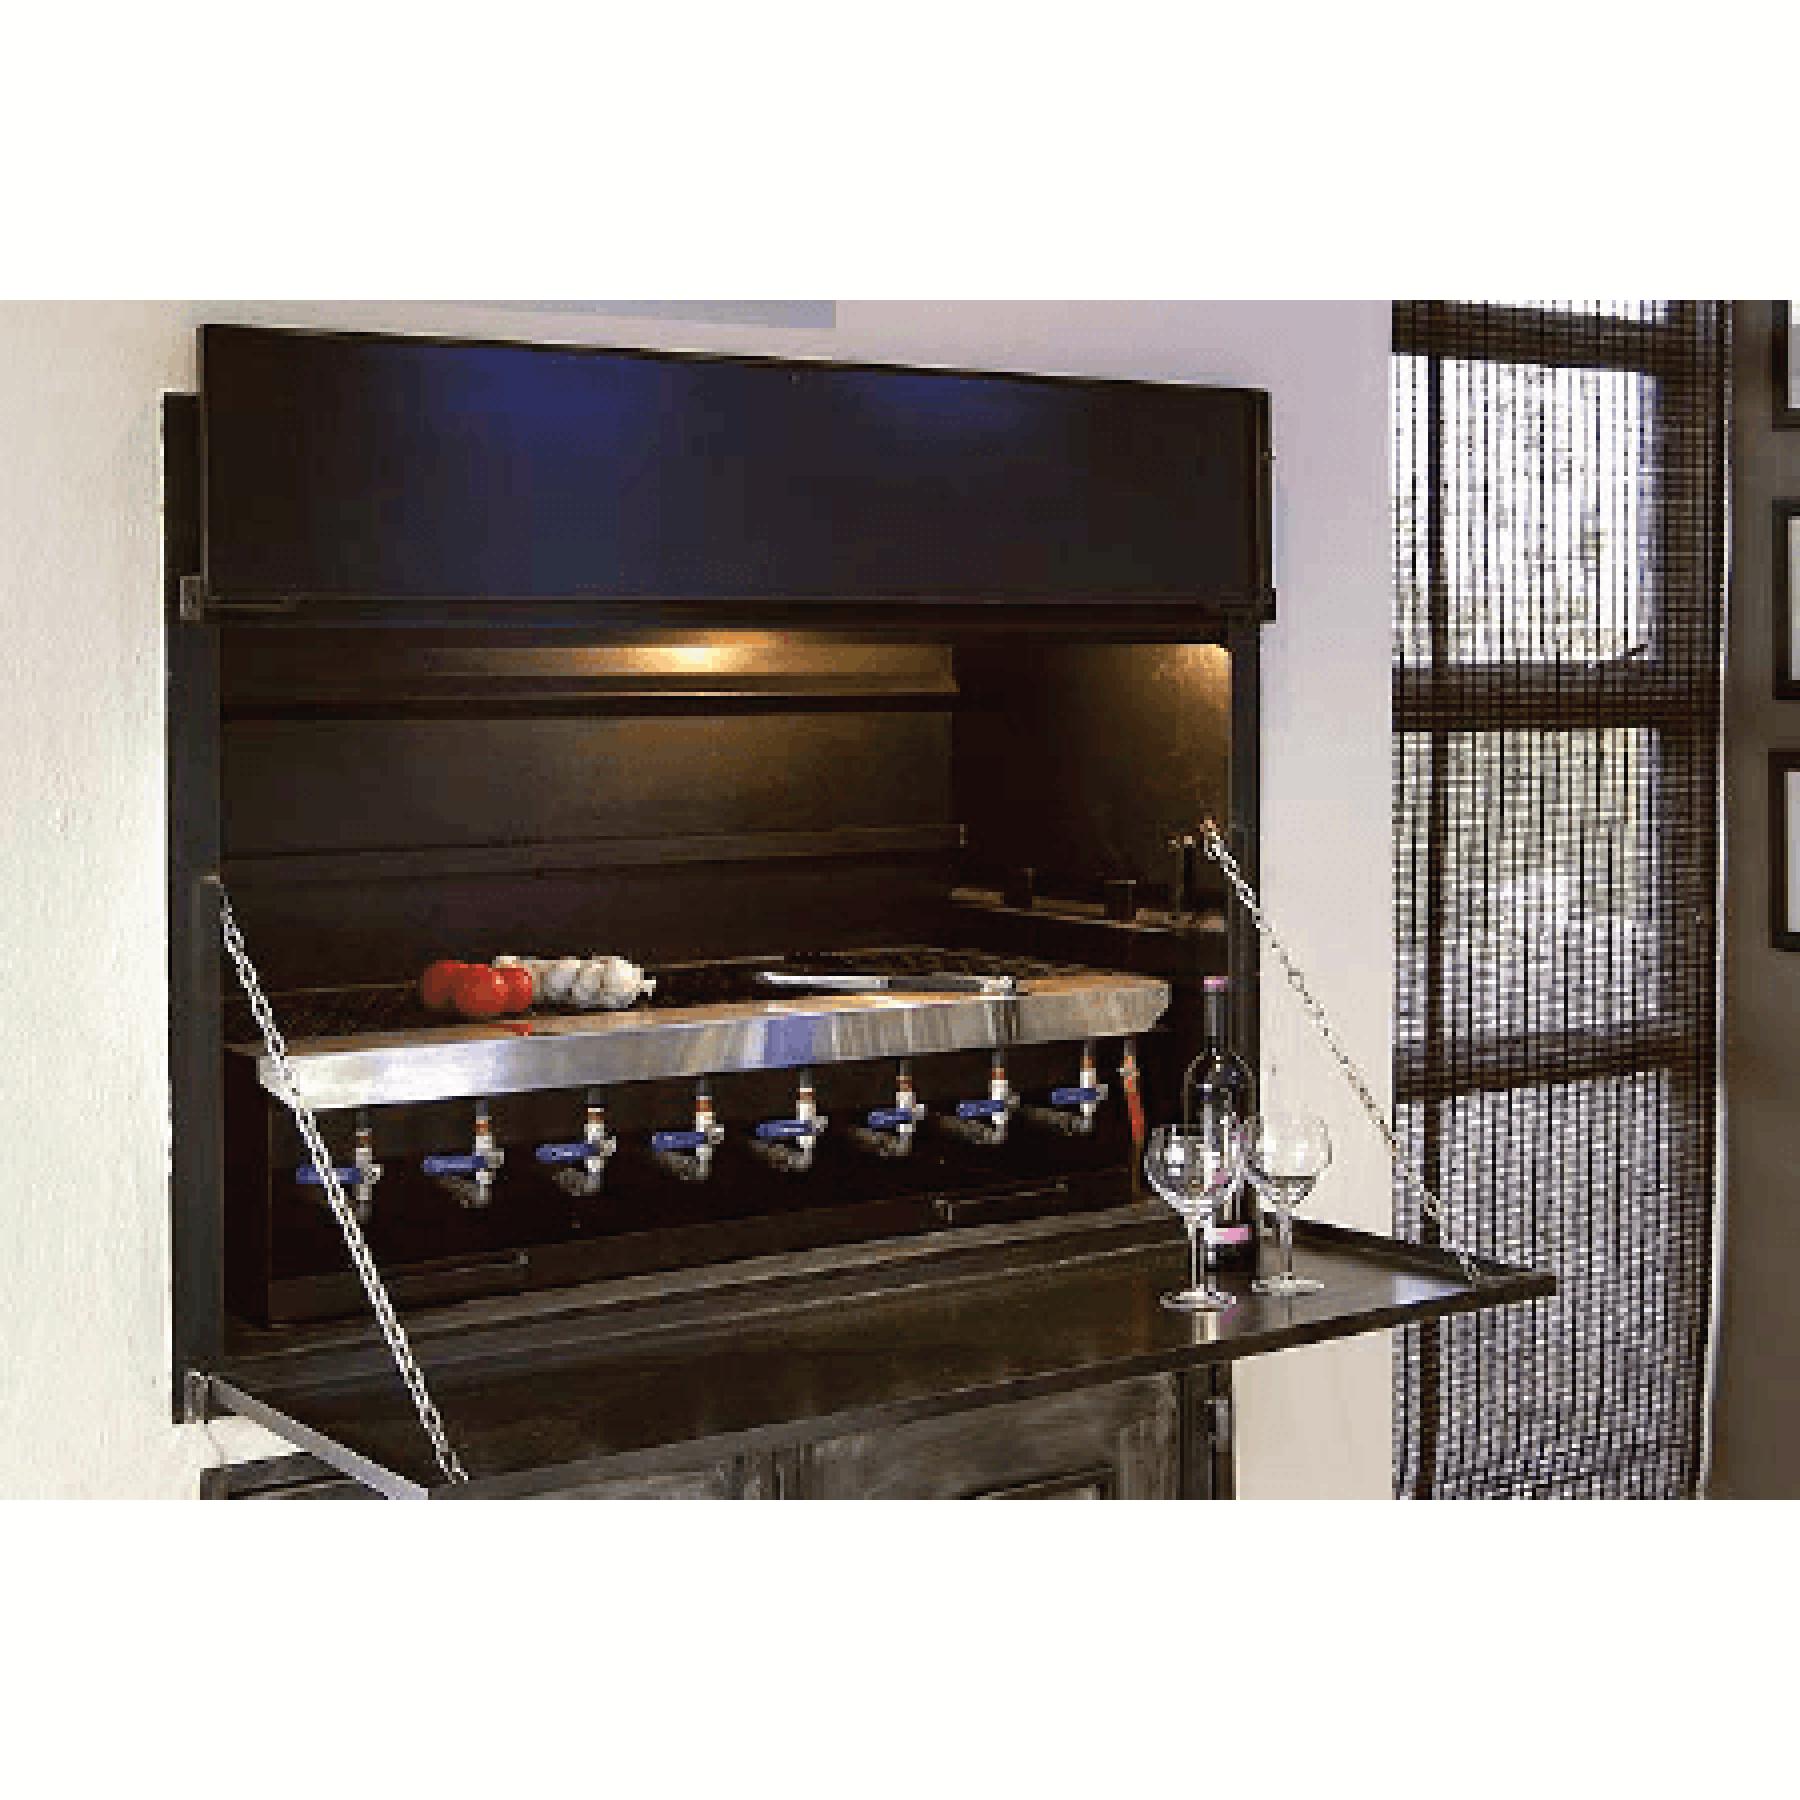 Braais-Gas-8-Burner-Gas-Grill